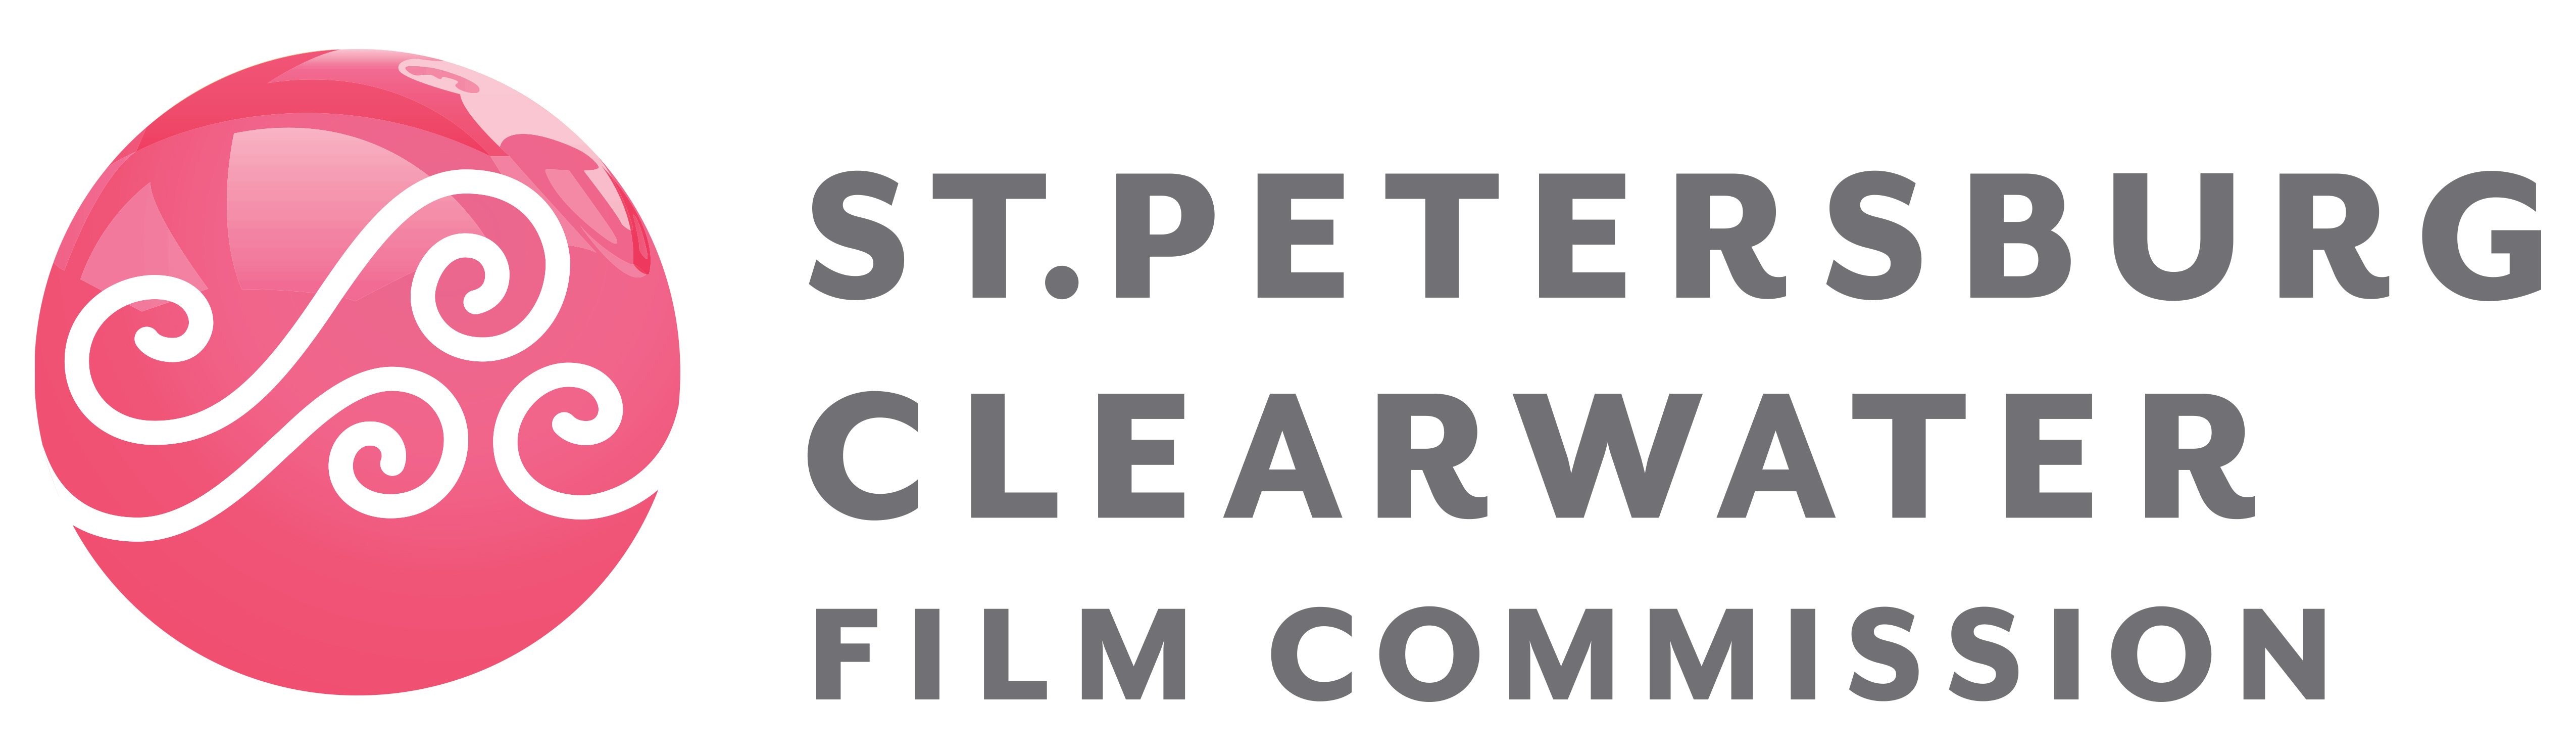 Film Commission Website